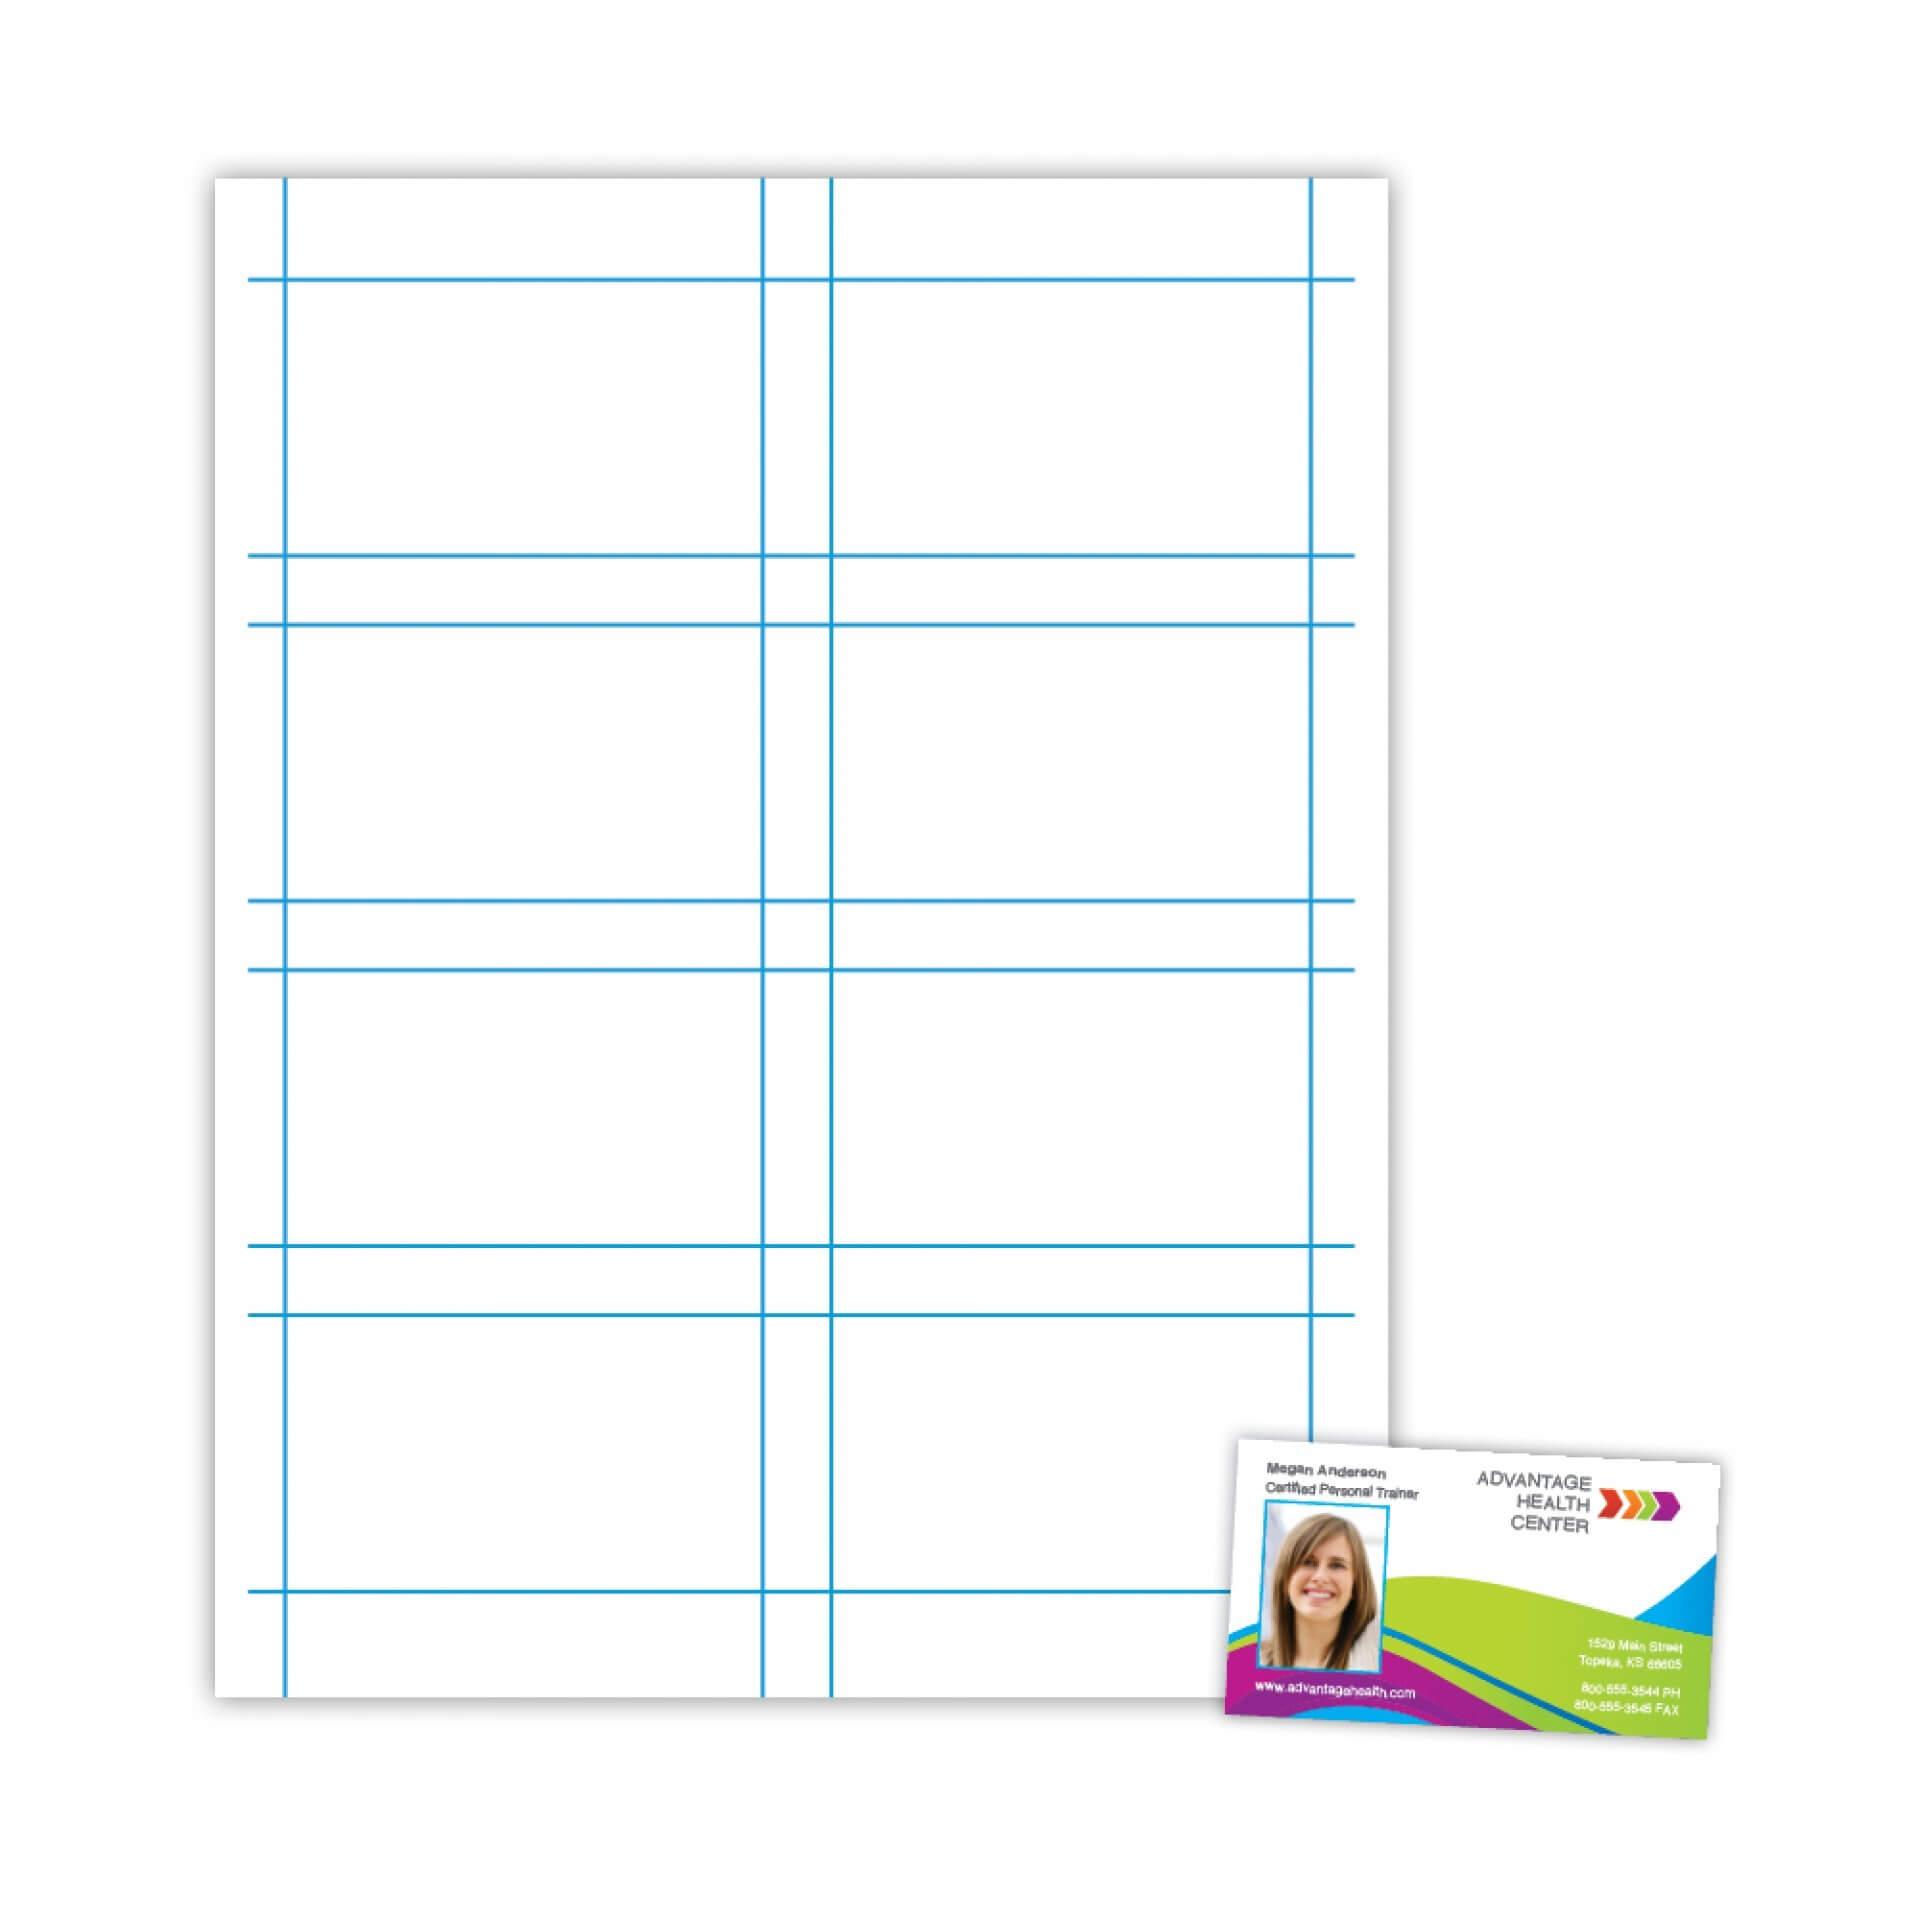 008 Blank Business Card Template Free Microsoft Word regarding Blank Business Card Template For Word